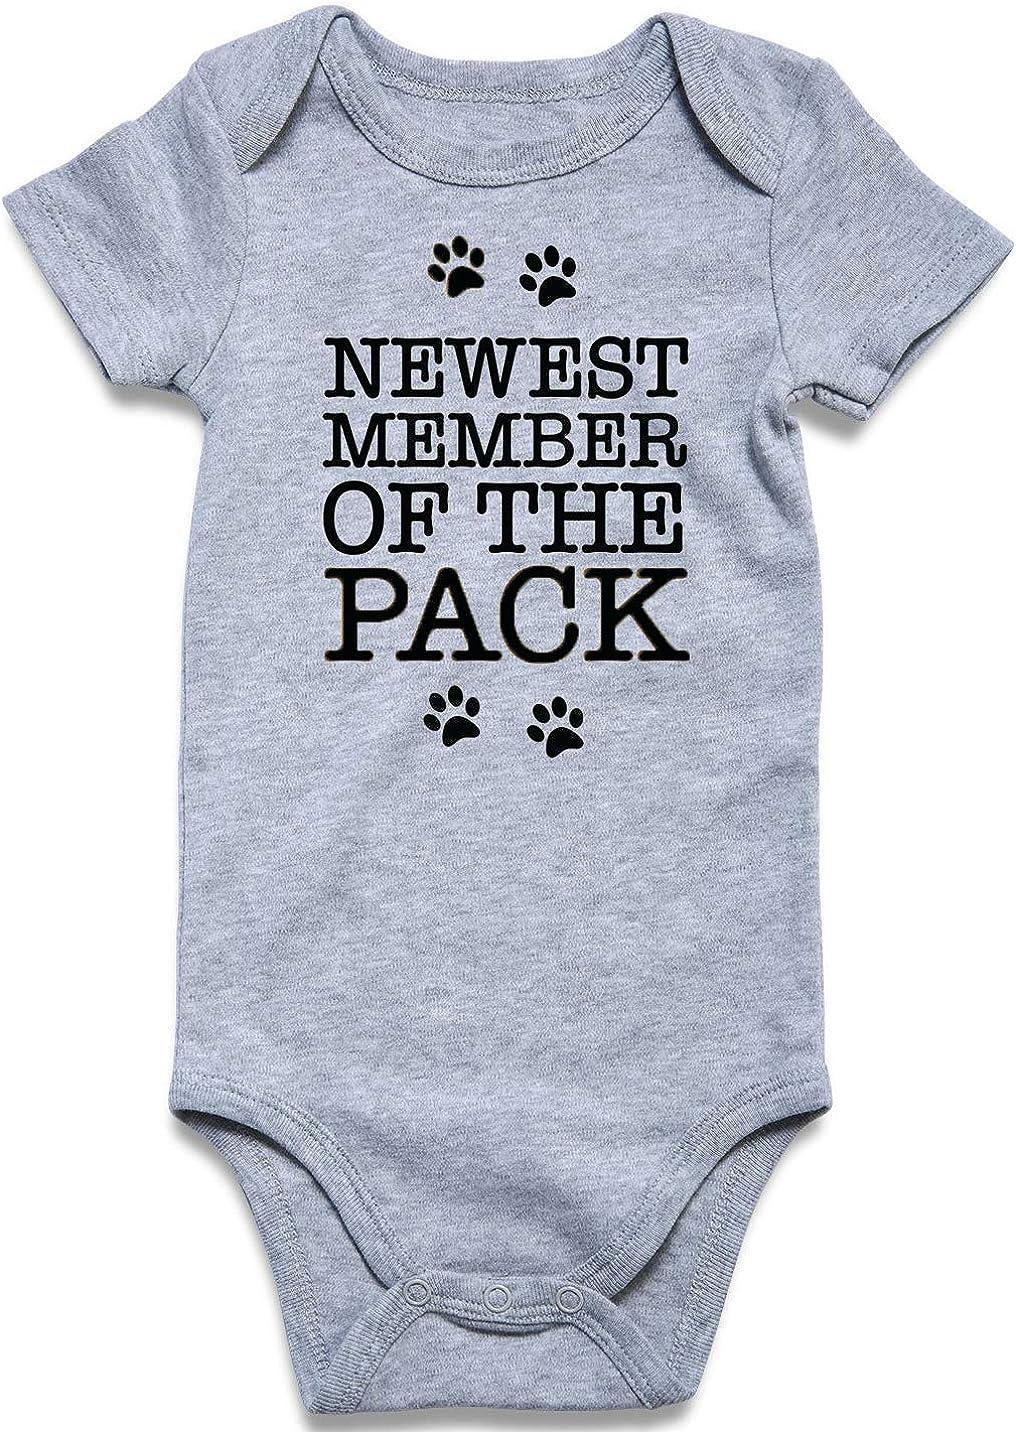 UNICOMIDEA Baby Boys Girls Romper Max Bargain sale 83% OFF Jumpsuit Short Printed Letter